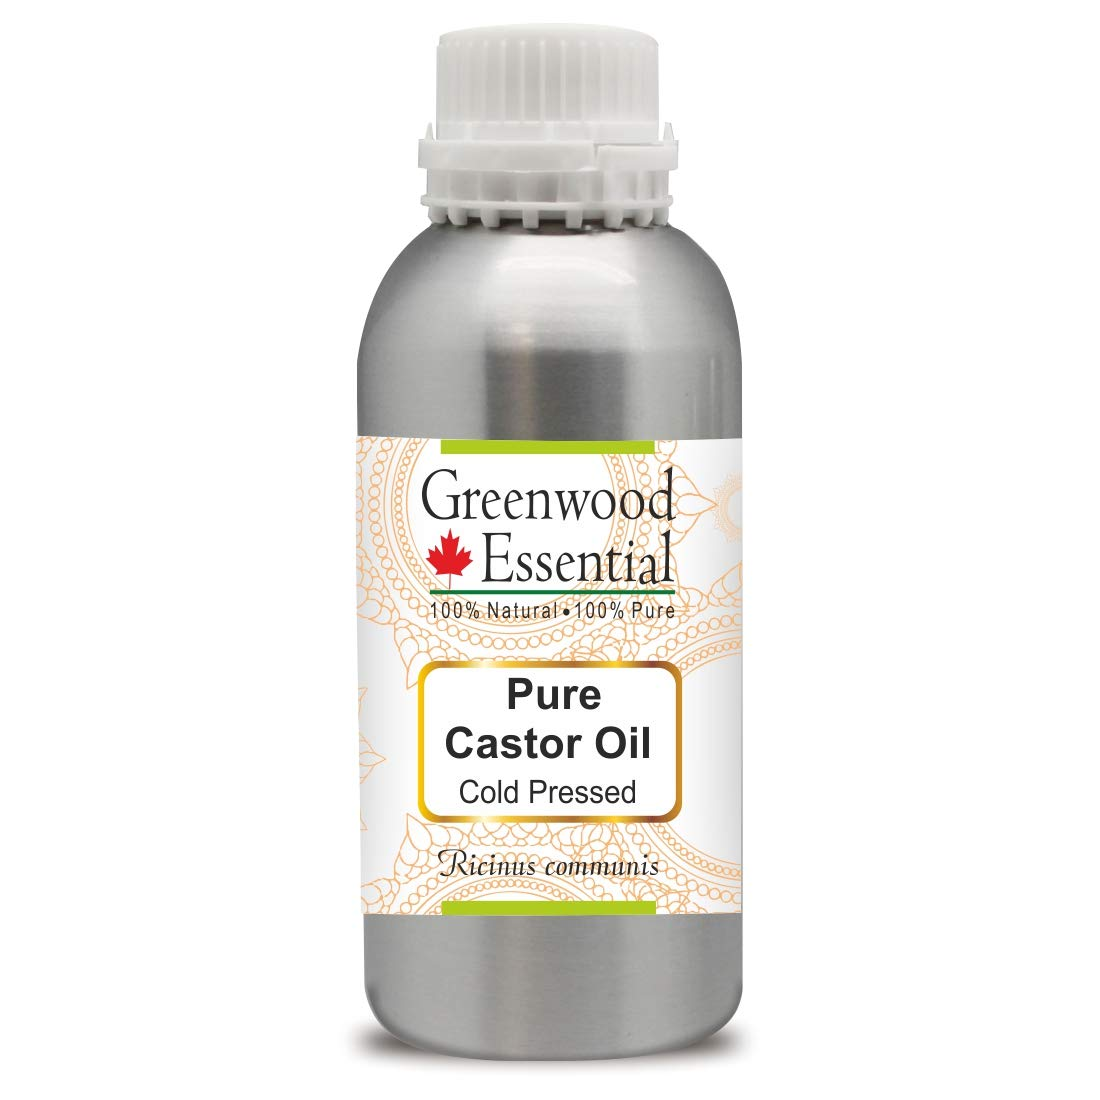 Greenwood Essential Pure Castor Oil communis Natu 40% OFF Cheap Sale Ricinus 100% Max 87% OFF